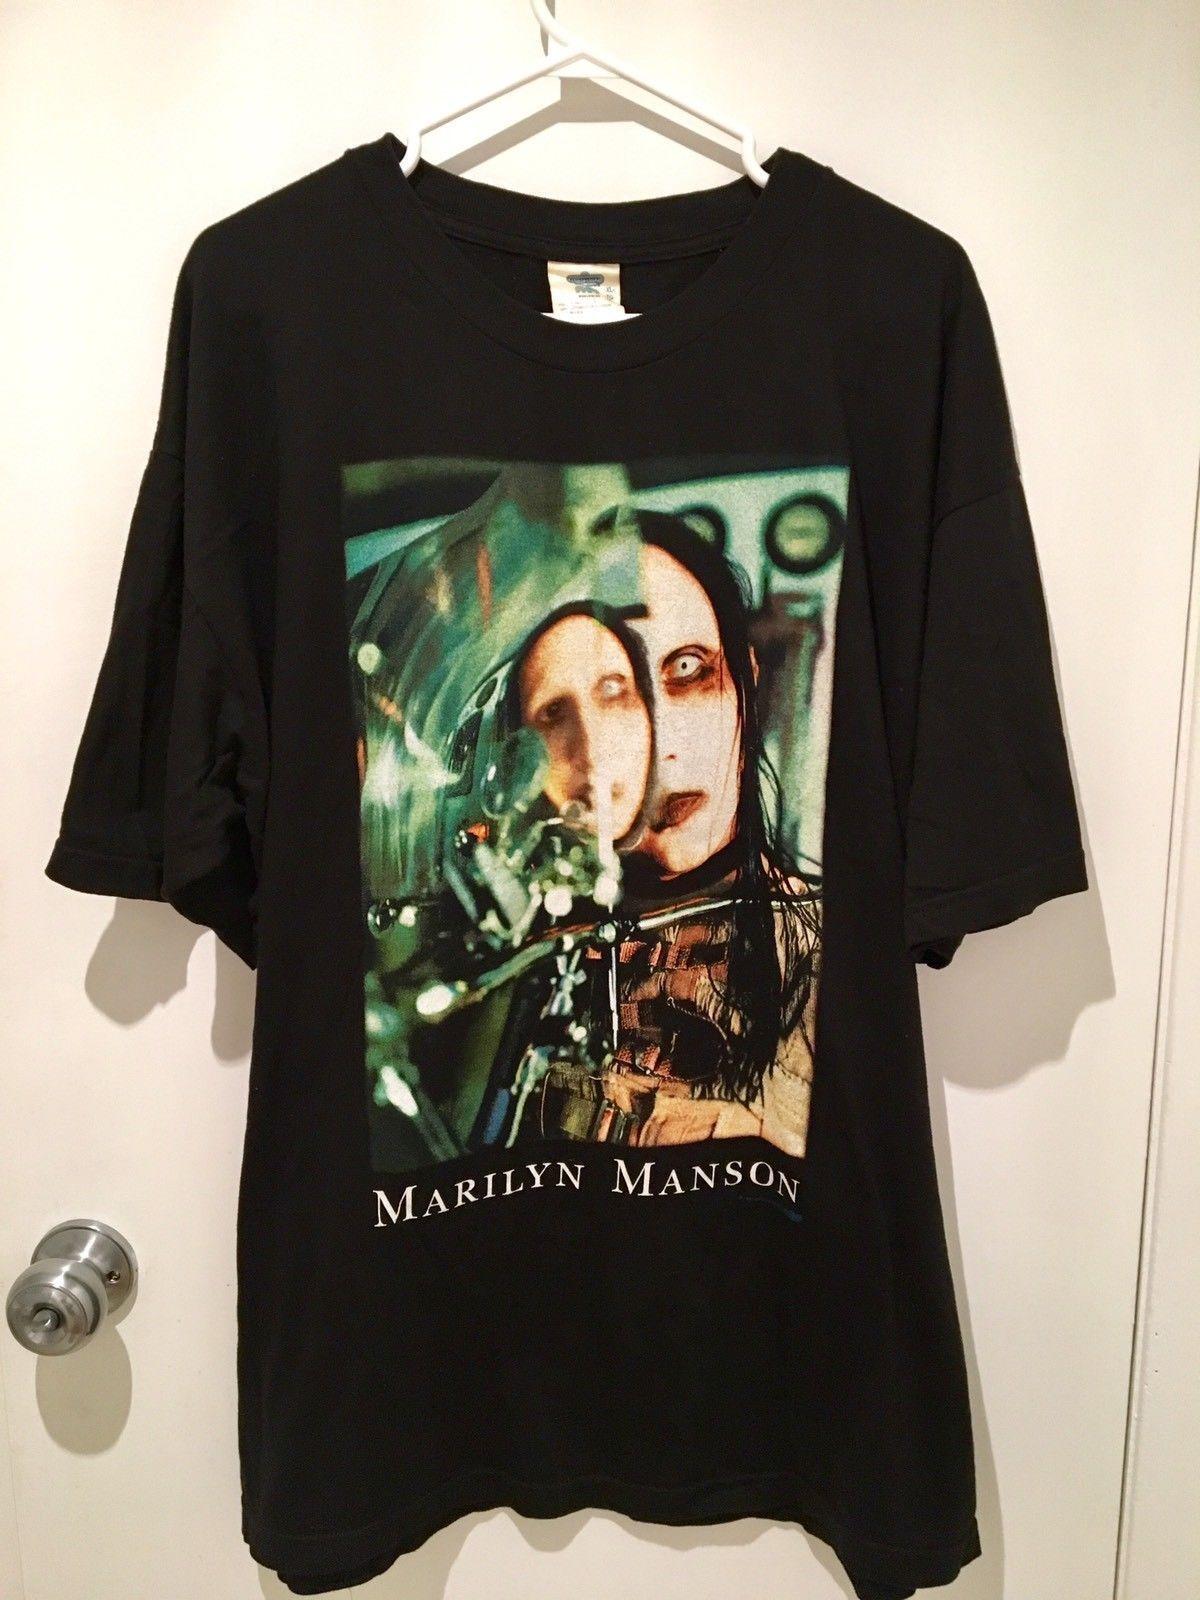 Vintage 1997 Marilyn Manson Beautiful People T Shirt VERY RARE Hot Sale Sleeves Boy Cotton Men T-Shirt Top Tee